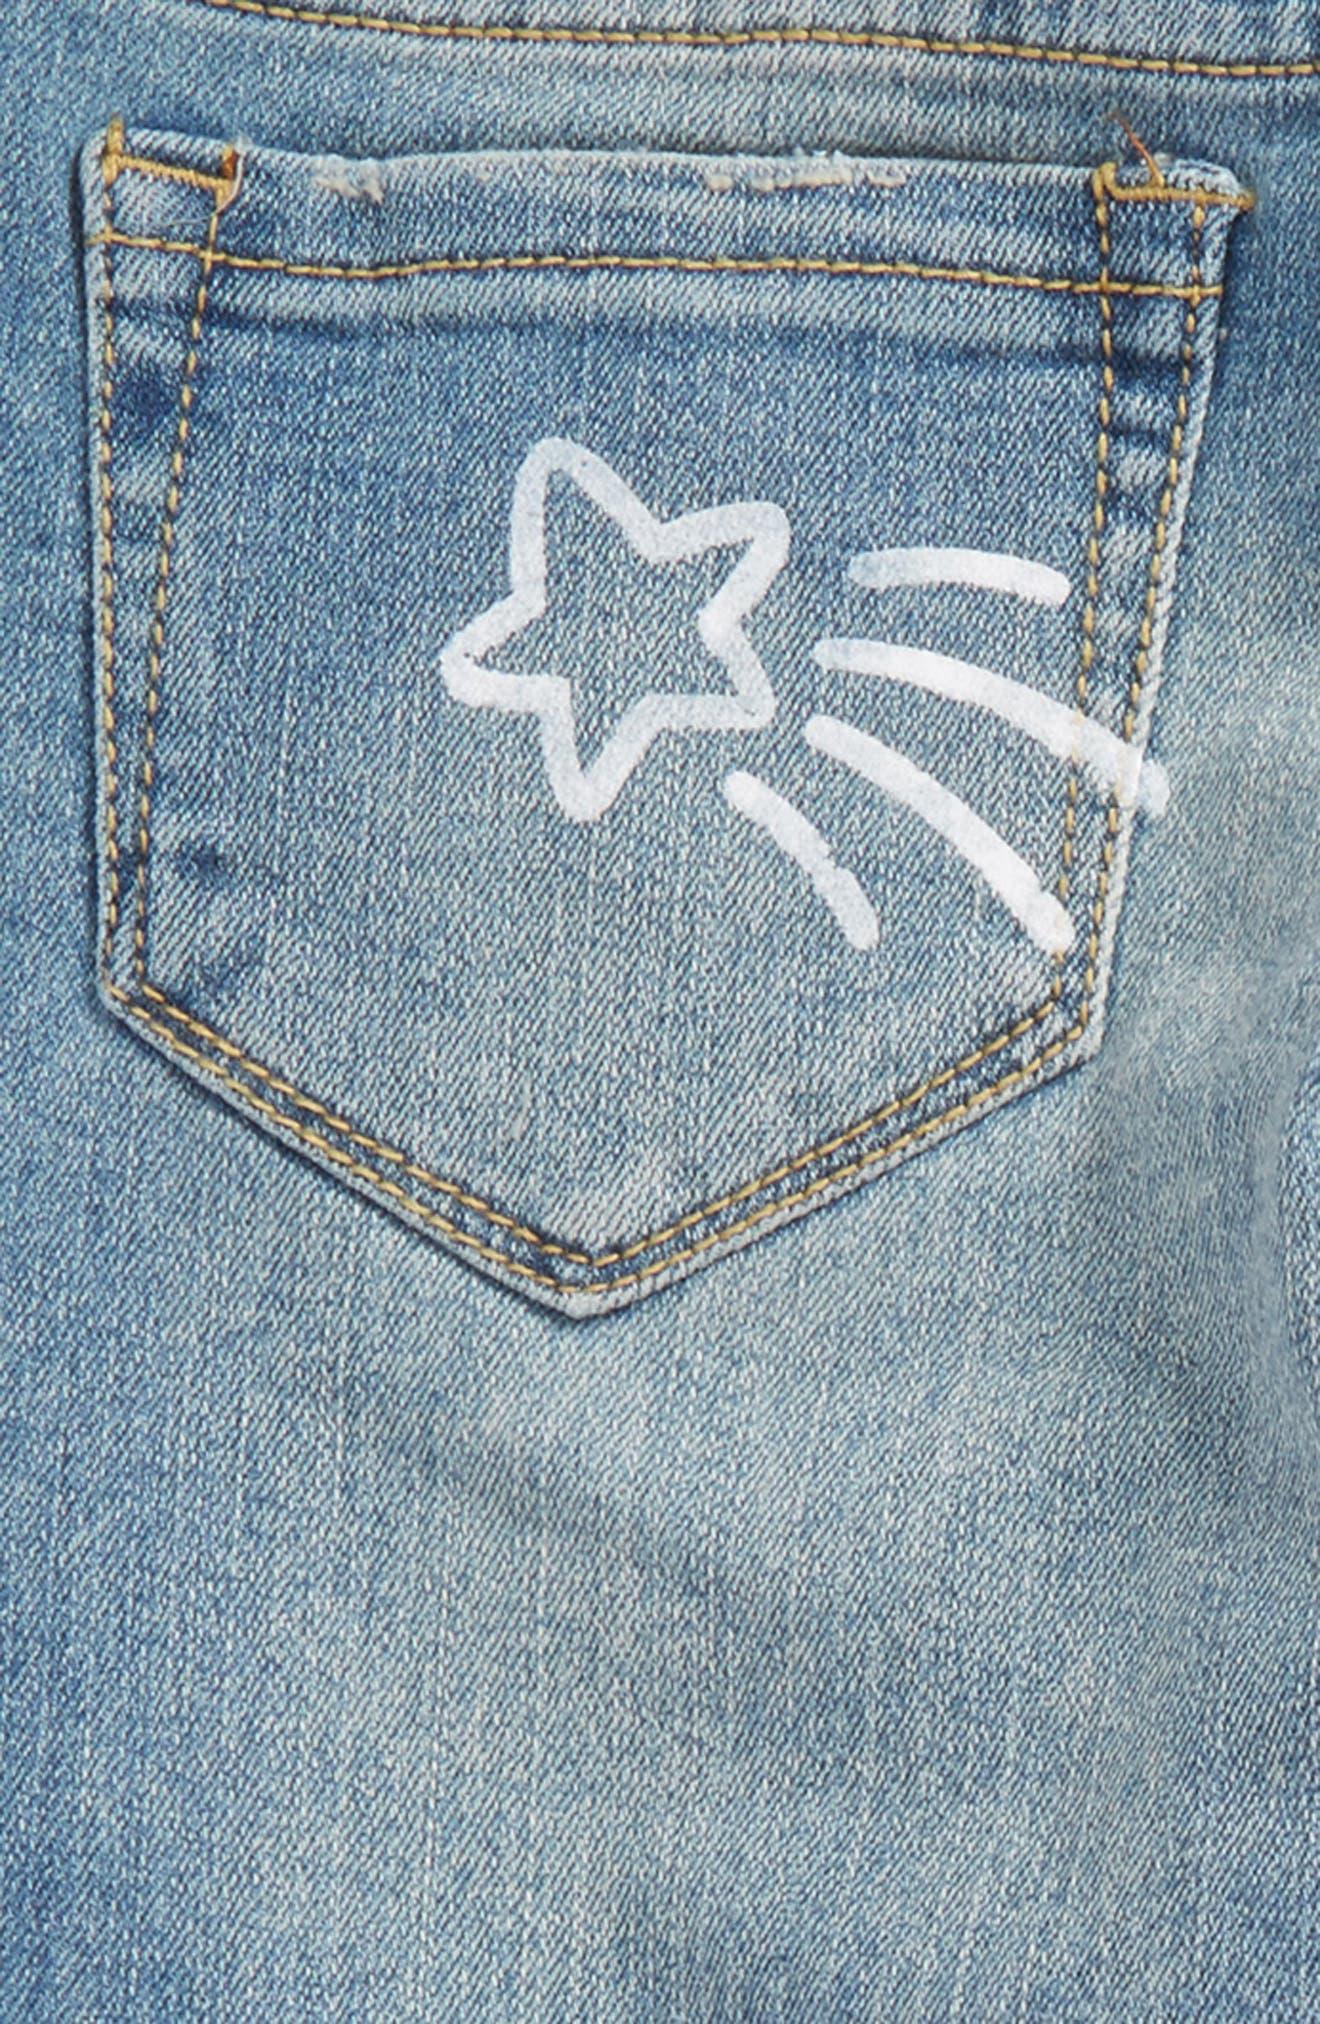 Alternate Image 3  - Tucker + Tate Conversational Distressed Skinny Jeans (Big Girls)